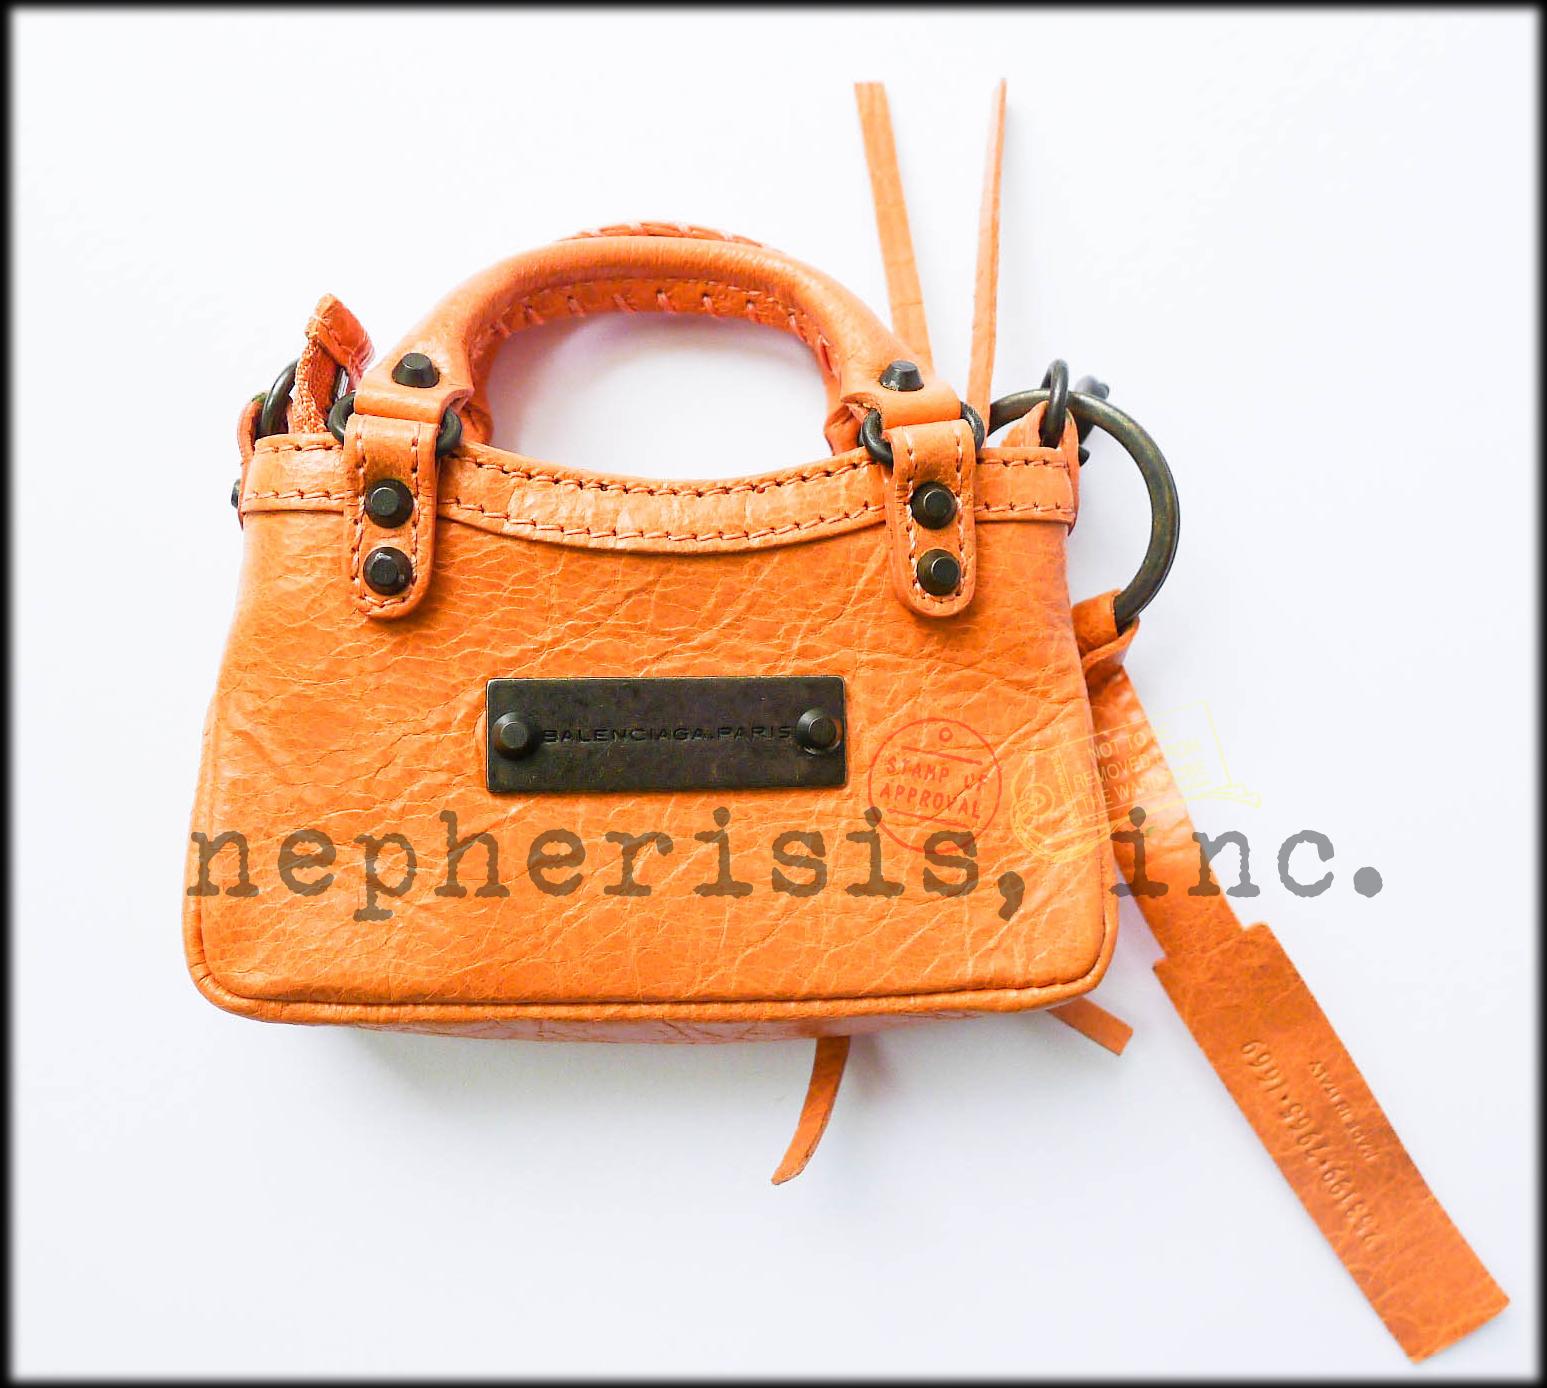 AUTH NEW 2012 Balenciaga MINI MINI FIRST MMF Keychain or Bag Charm ROSE BLUSH image 3